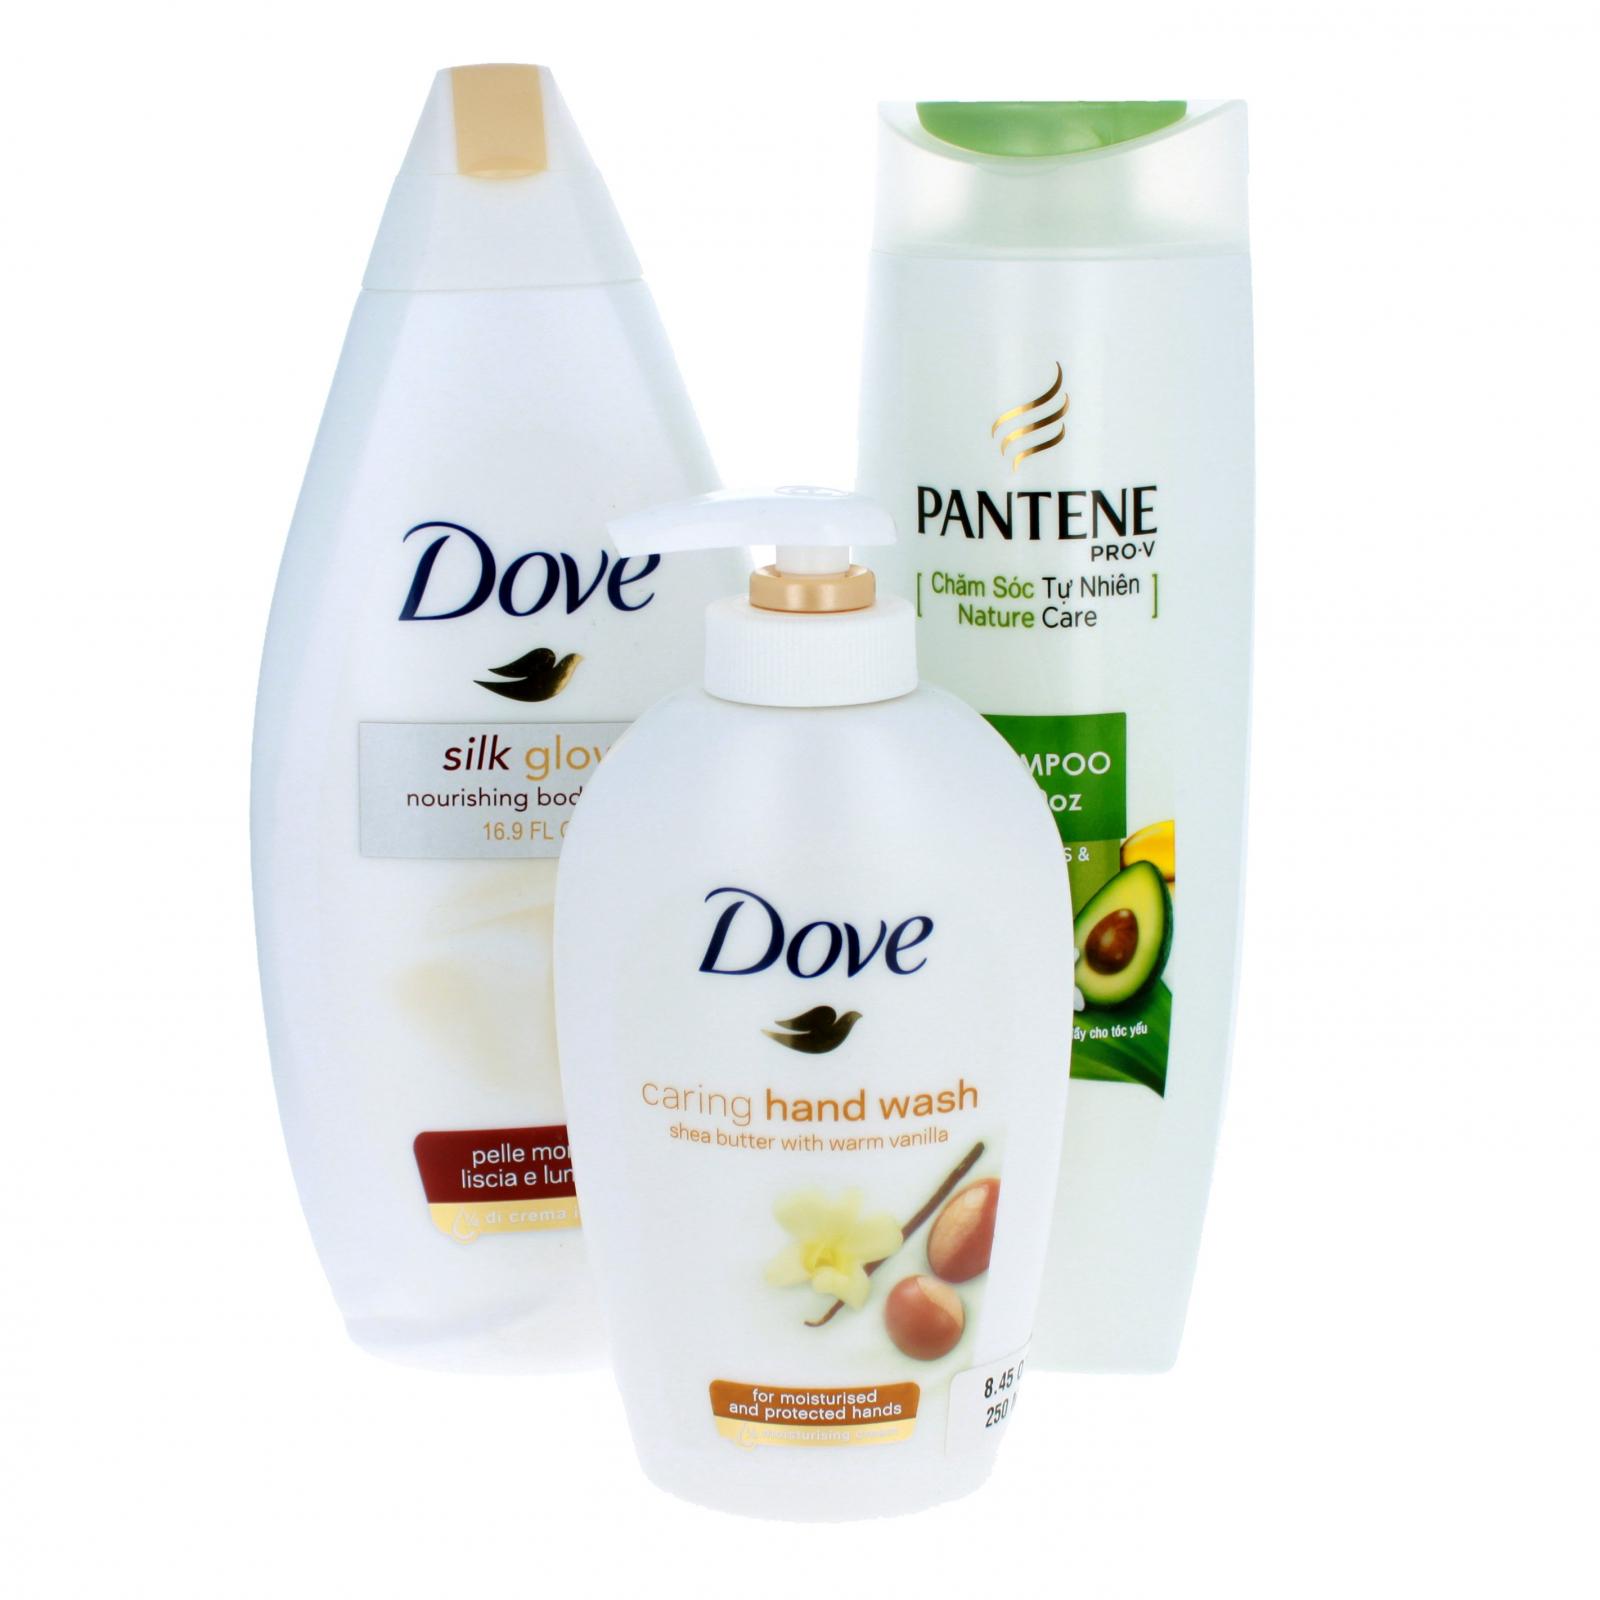 Dove Pantene Womens Spa Bath Body 3 Piece Care Set